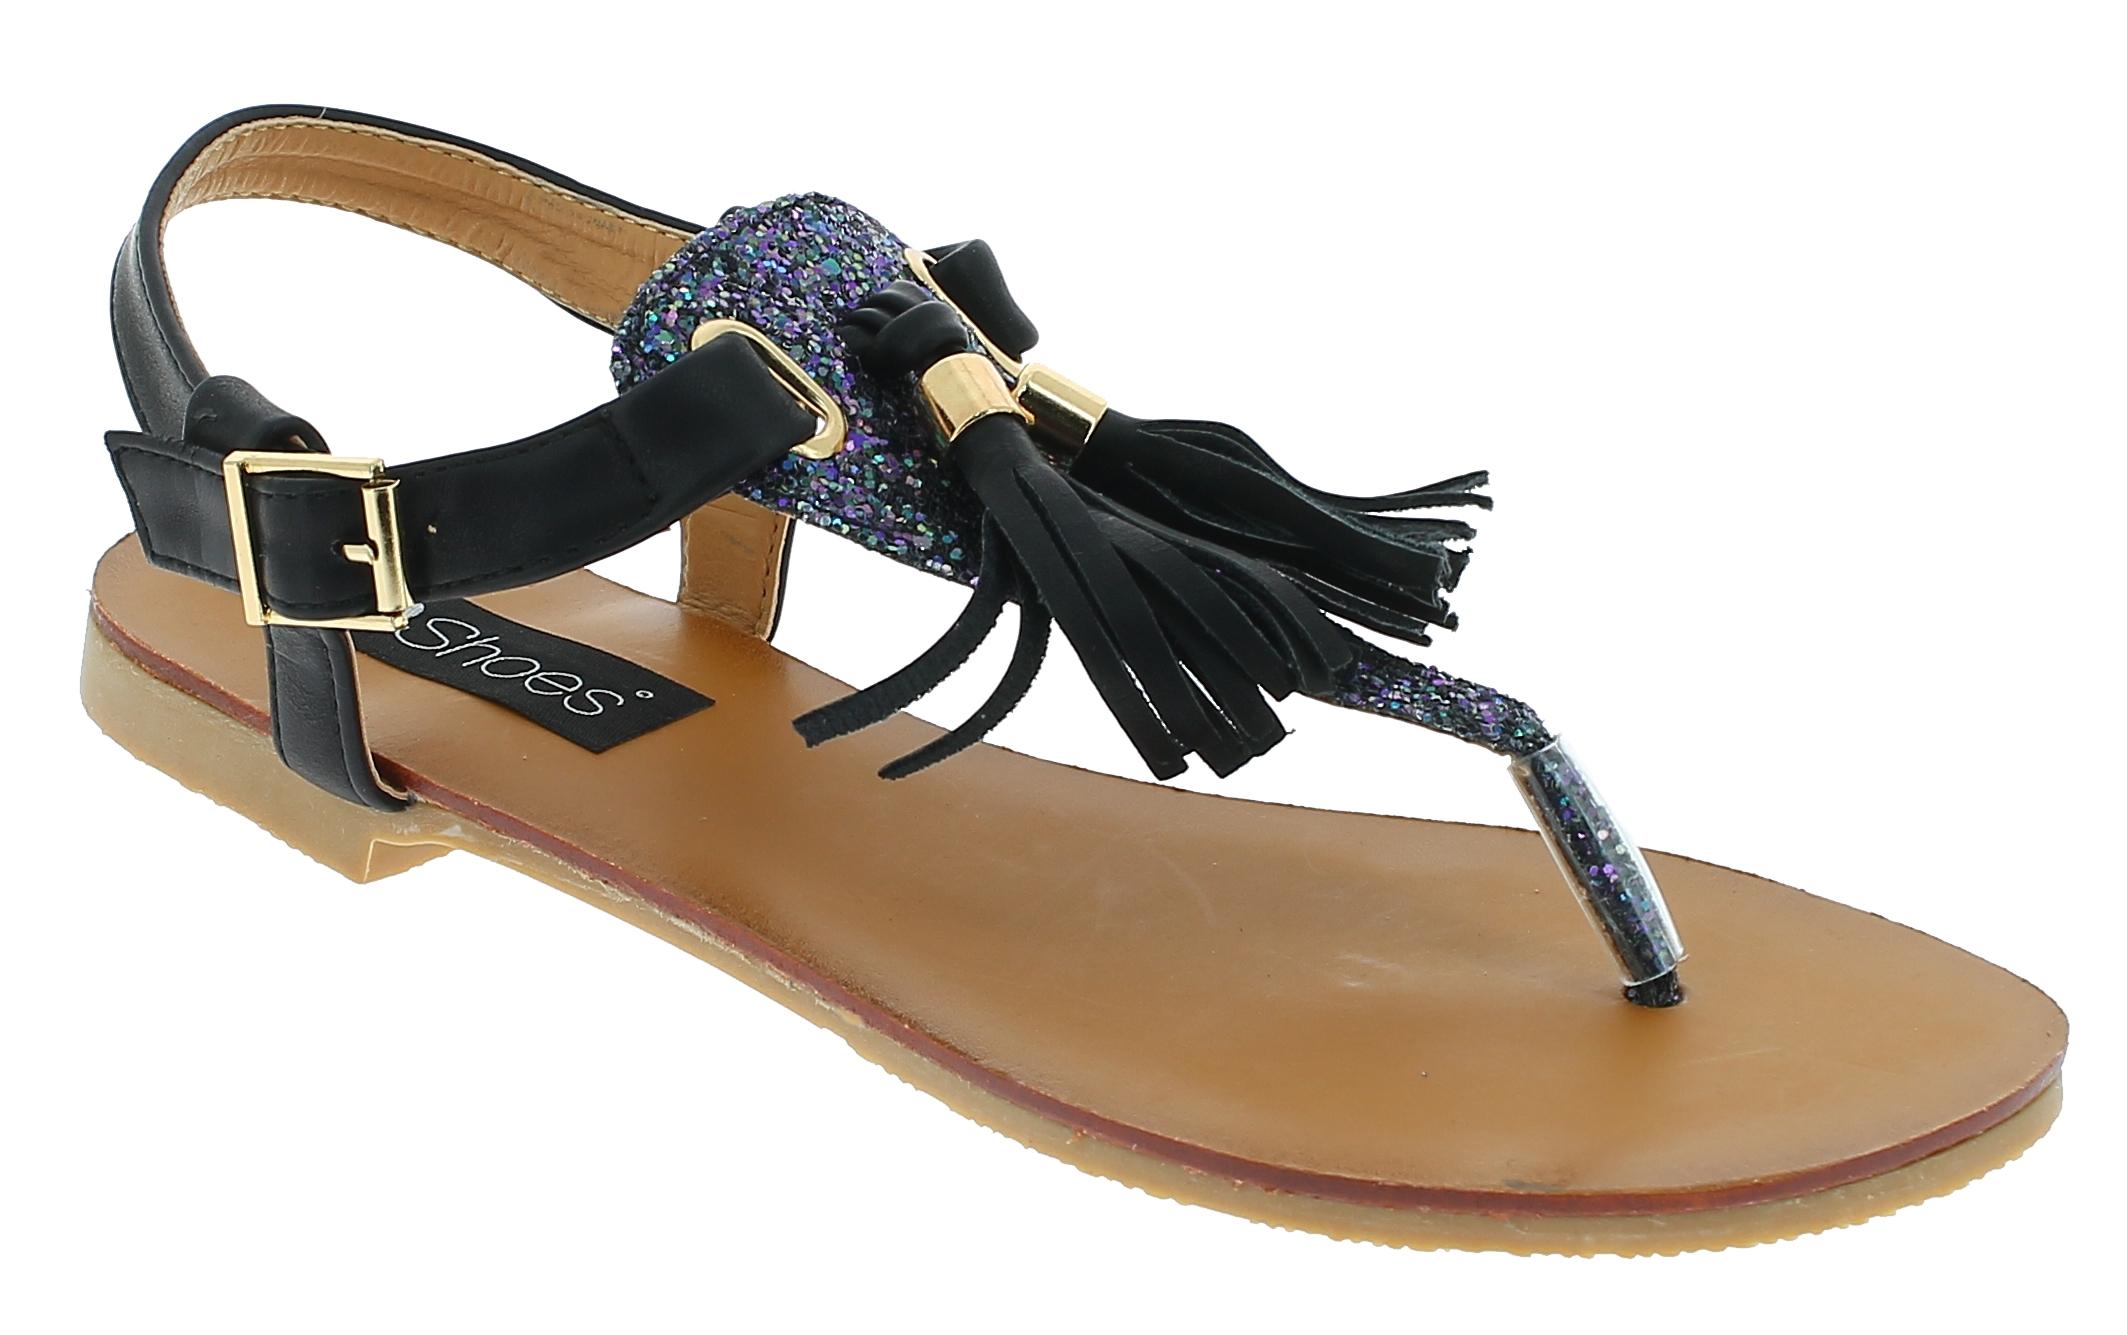 IQSHOES Γυναικεία Σανδάλια MY6711 Μαύρο - IqShoes - MY6711 BLACK -IQSHOES-black- παπούτσια  προσφορεσ